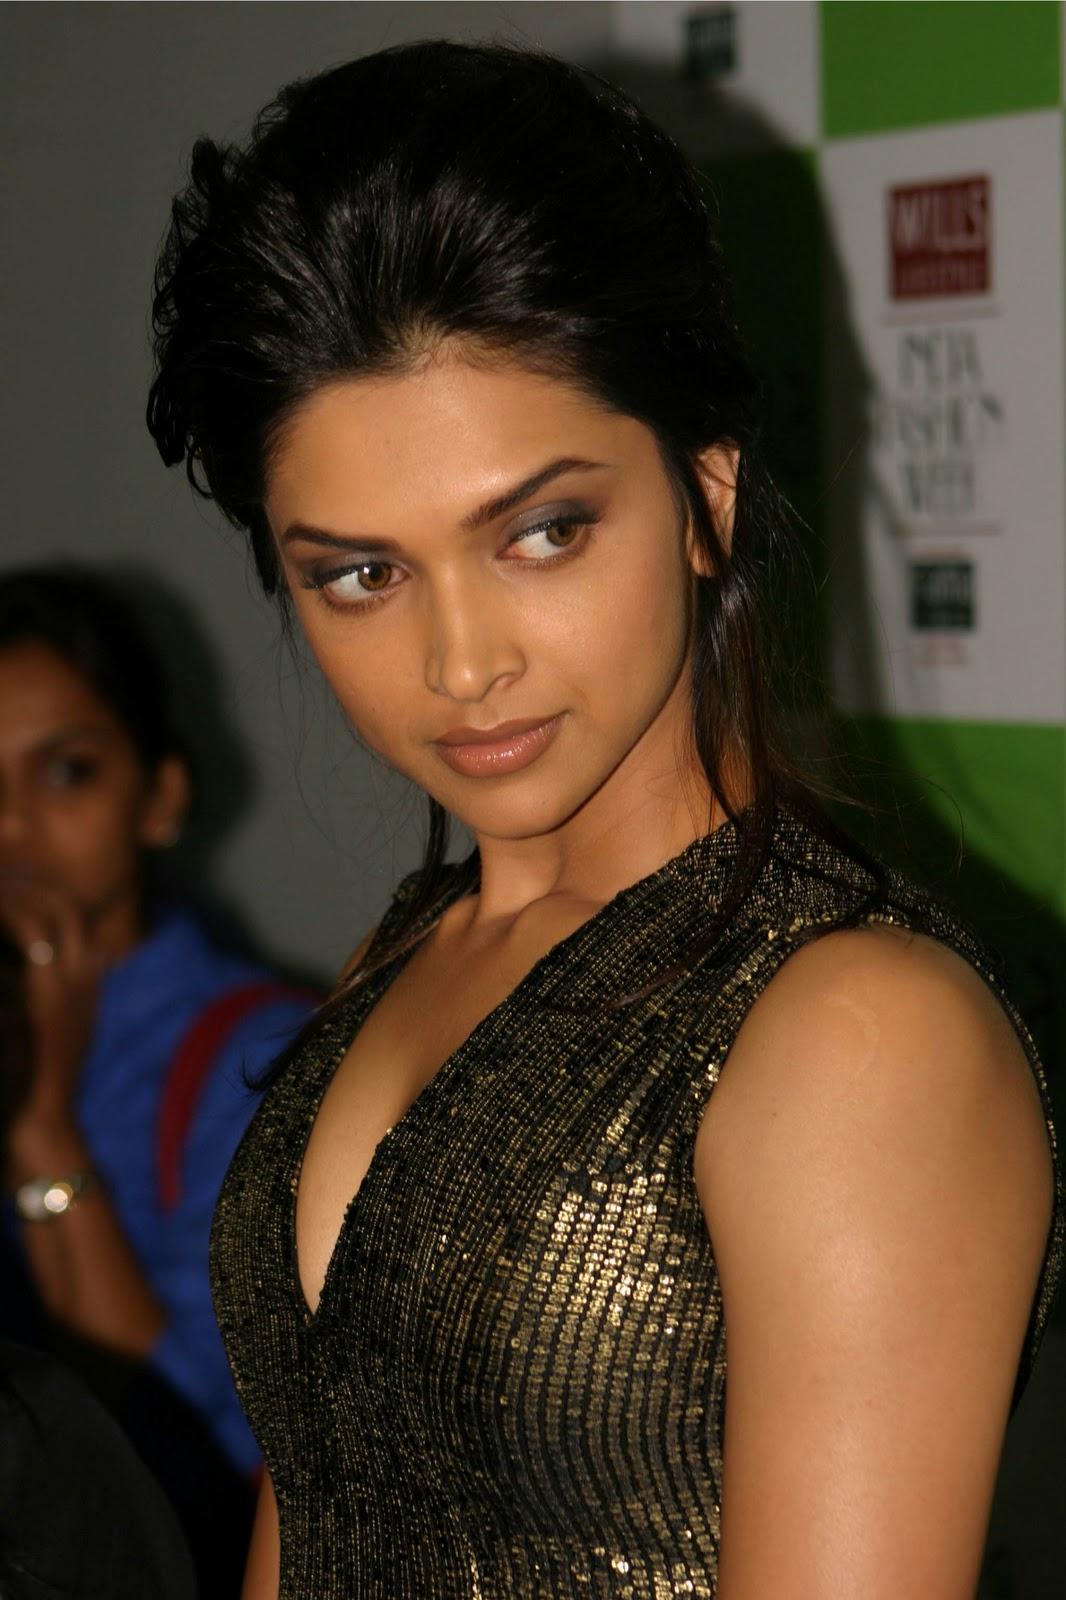 Deepika Padukone Hot Wallpapers at an Bollywood event ~ HOTWEB